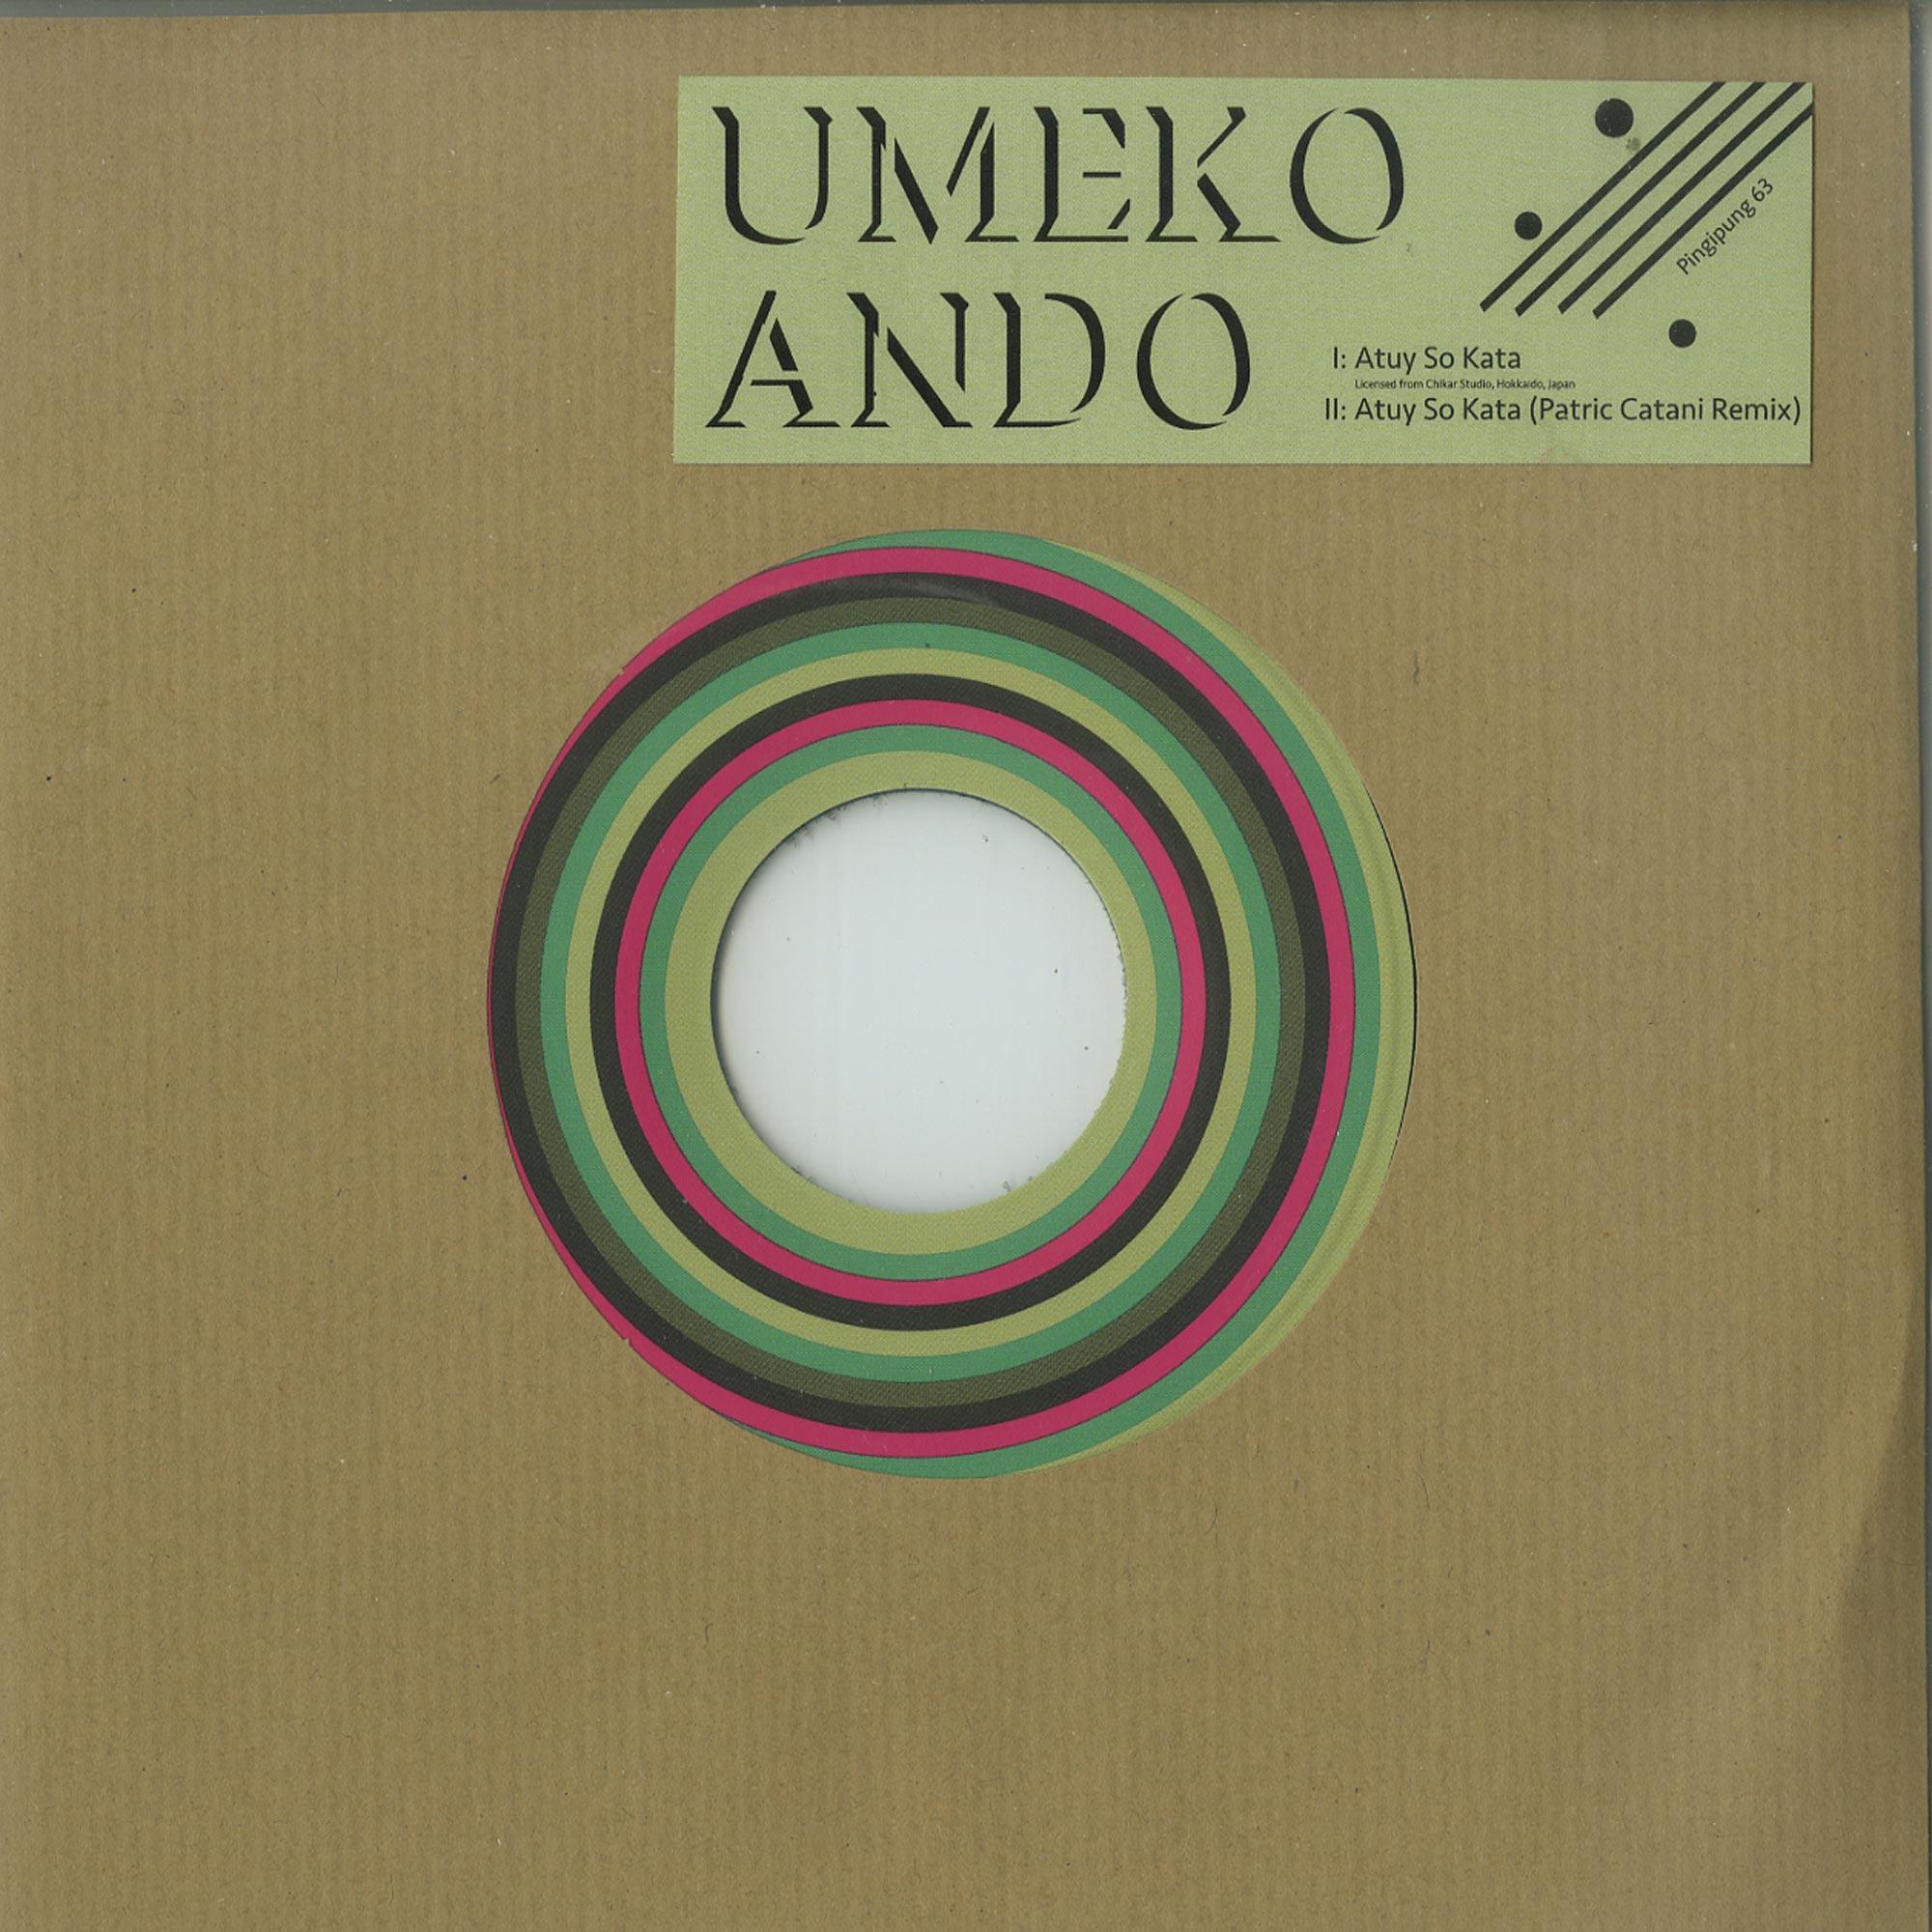 Umeko Ando - ATUY SO KATA